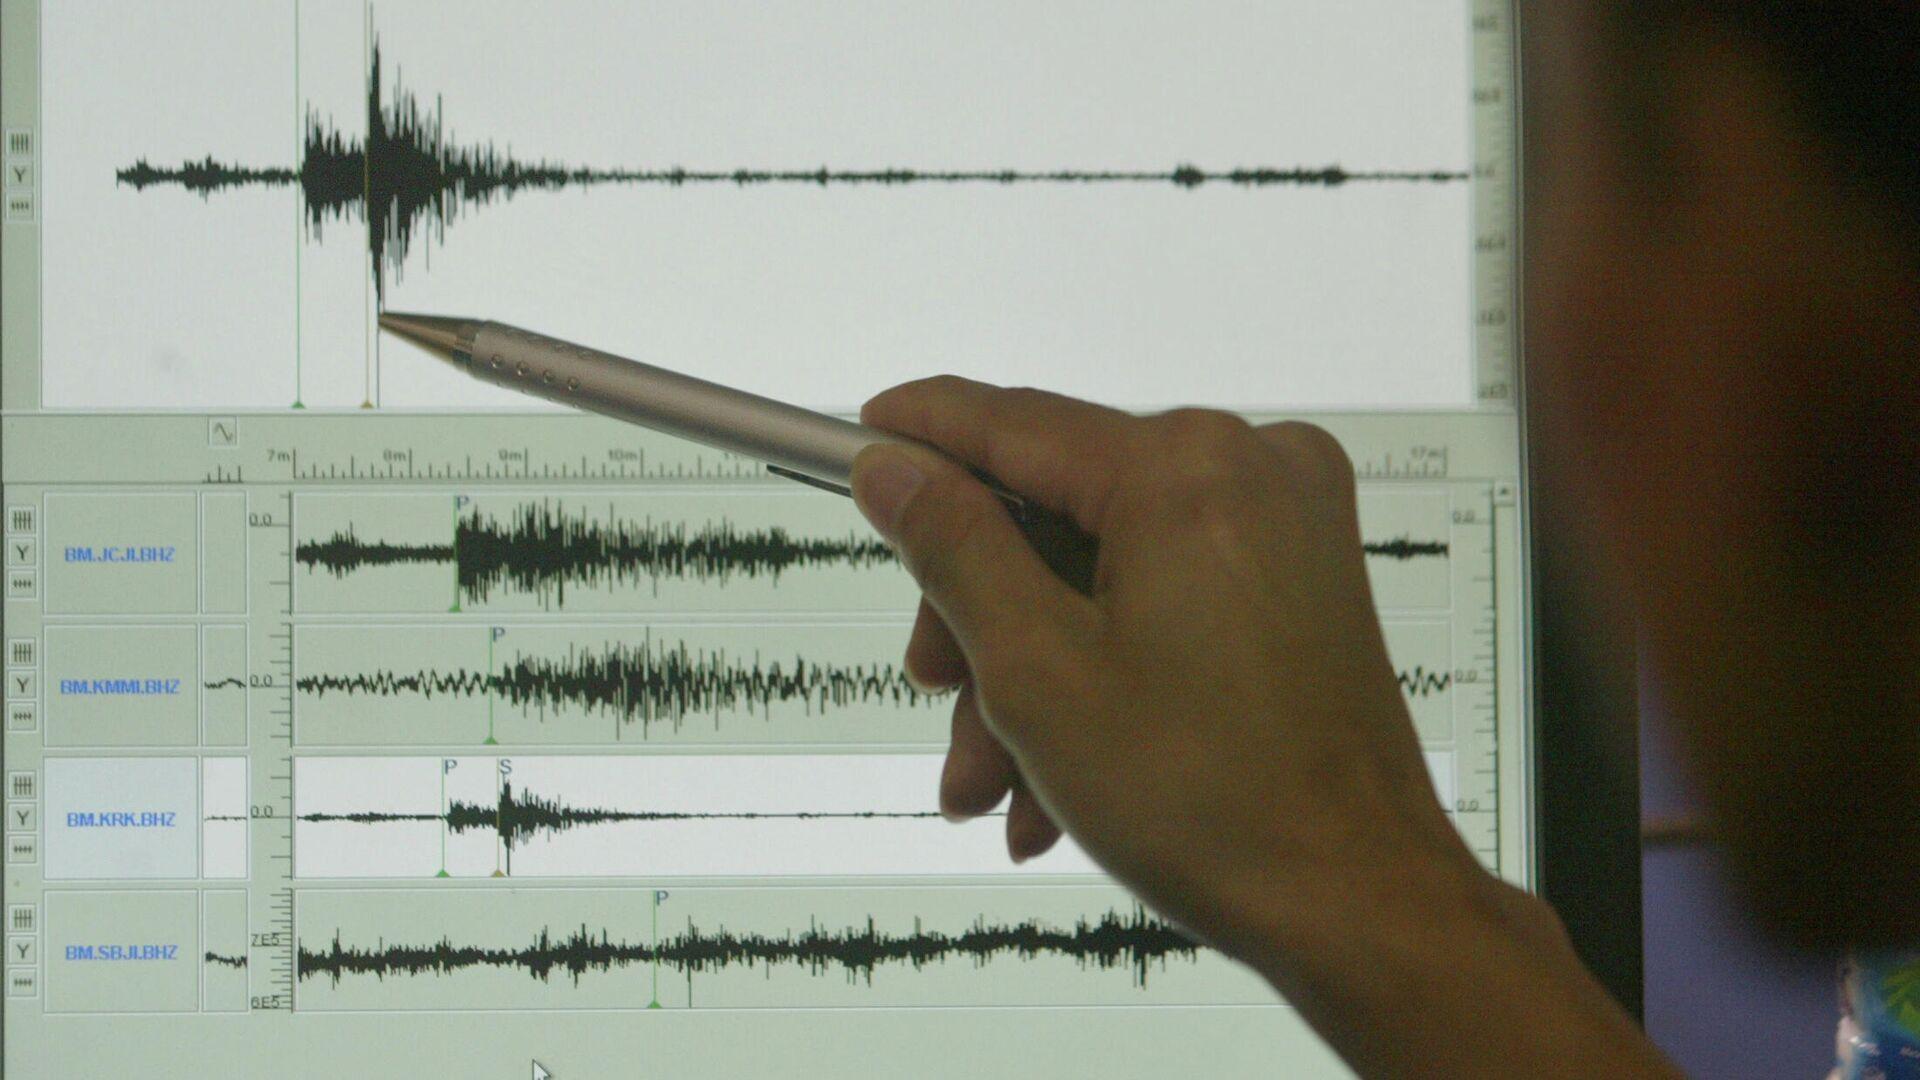 Erdbeben (Symbolbild) - SNA, 1920, 09.07.2021